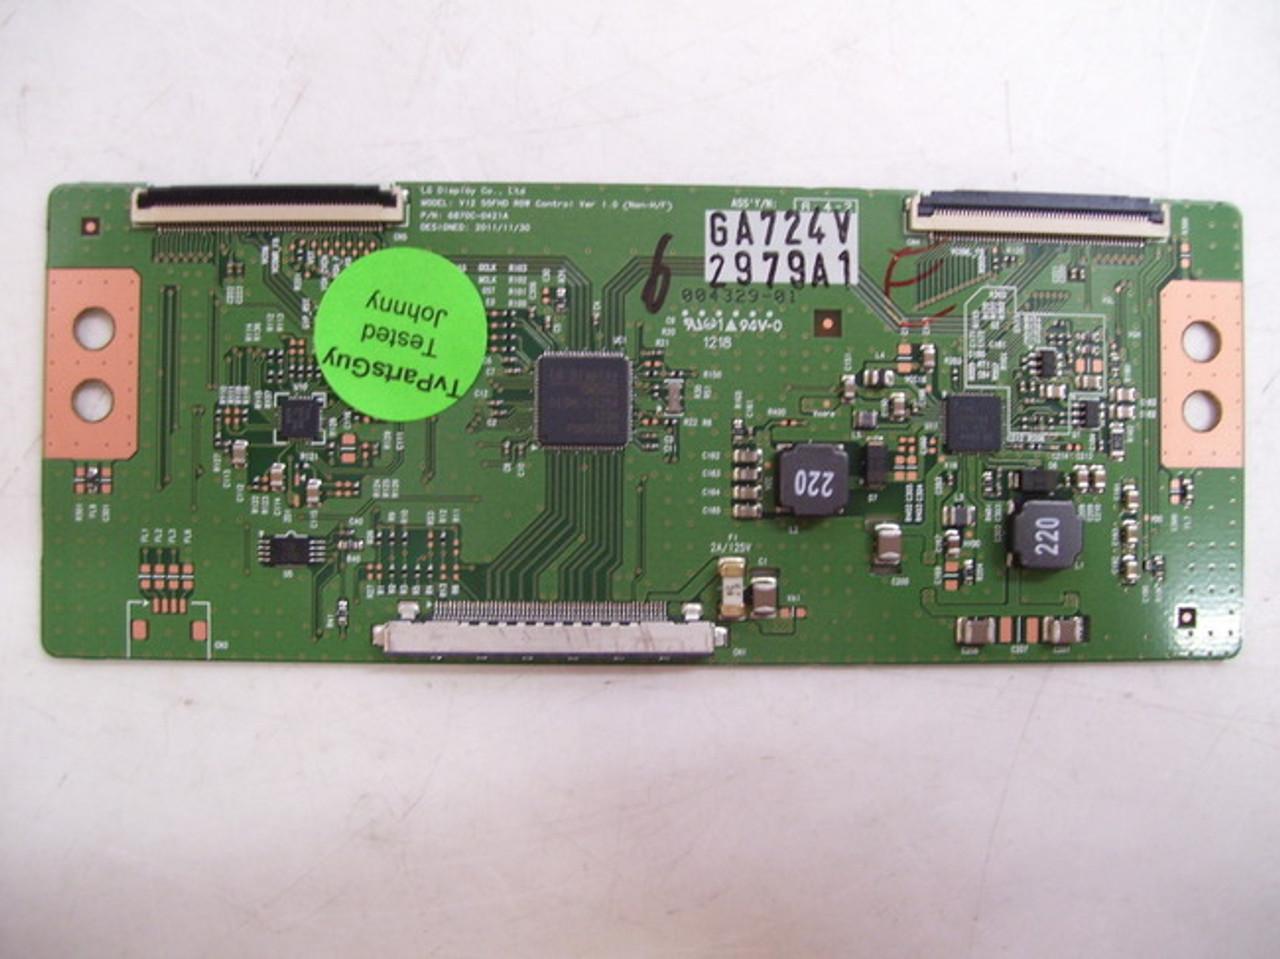 LG 55LS4500-UD 6870C-0401B T-CON BOARD